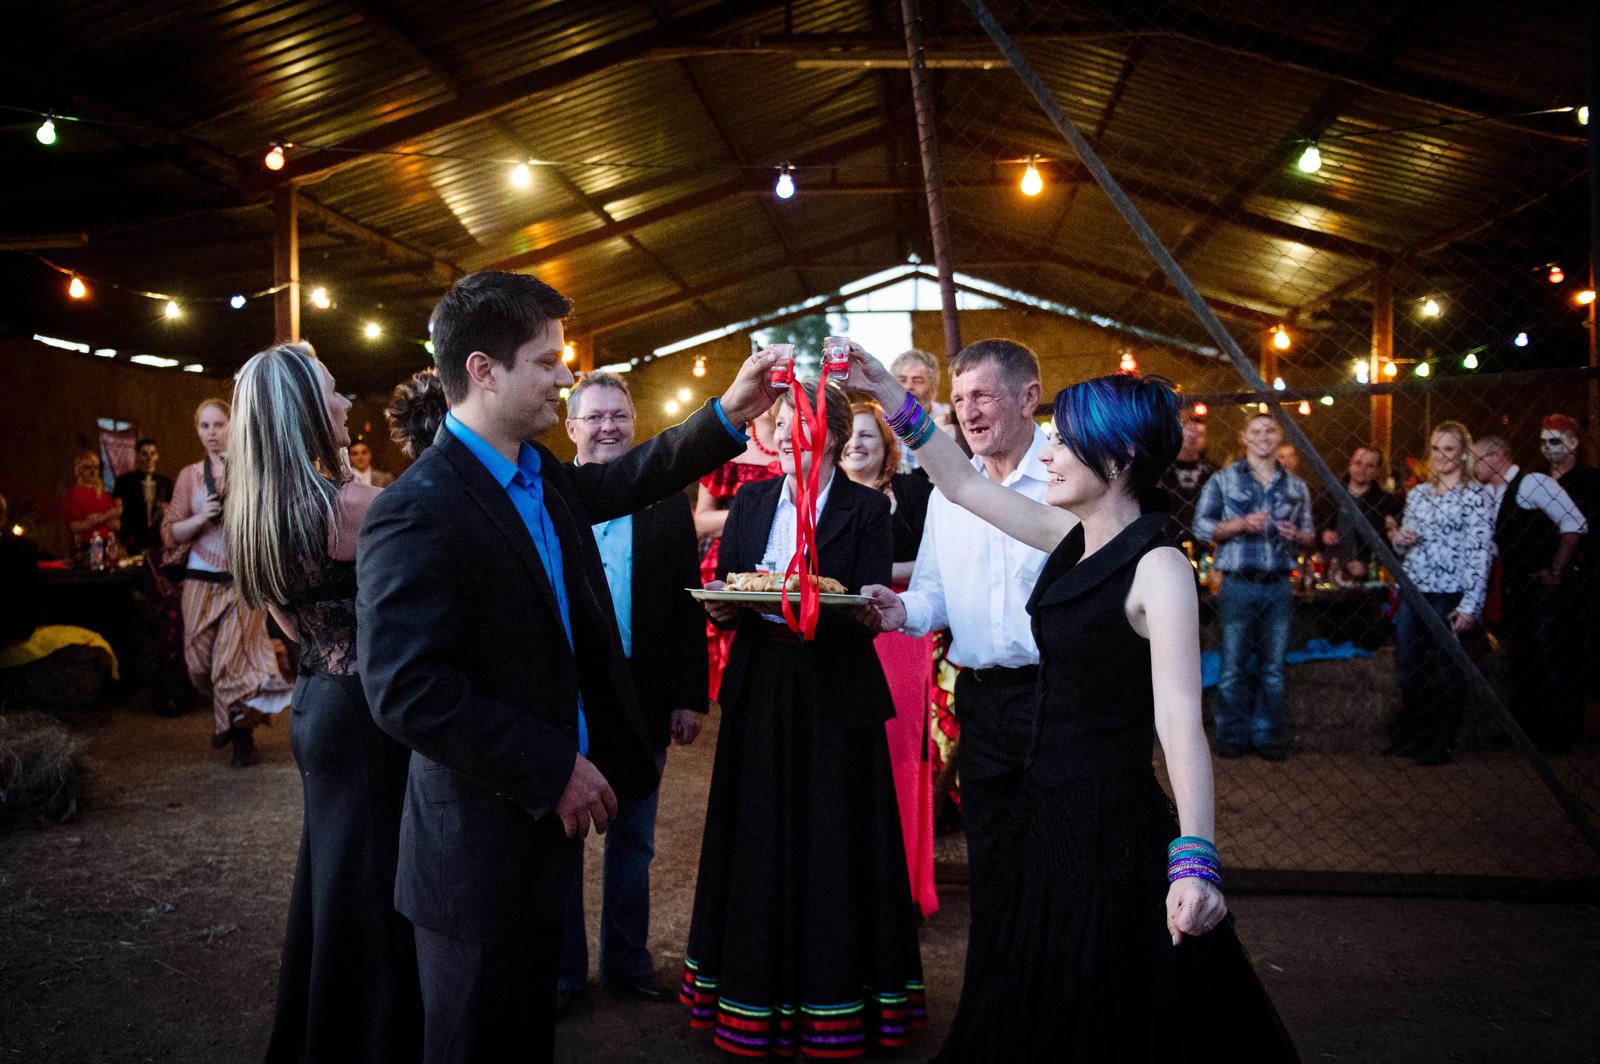 polish wedding tradition